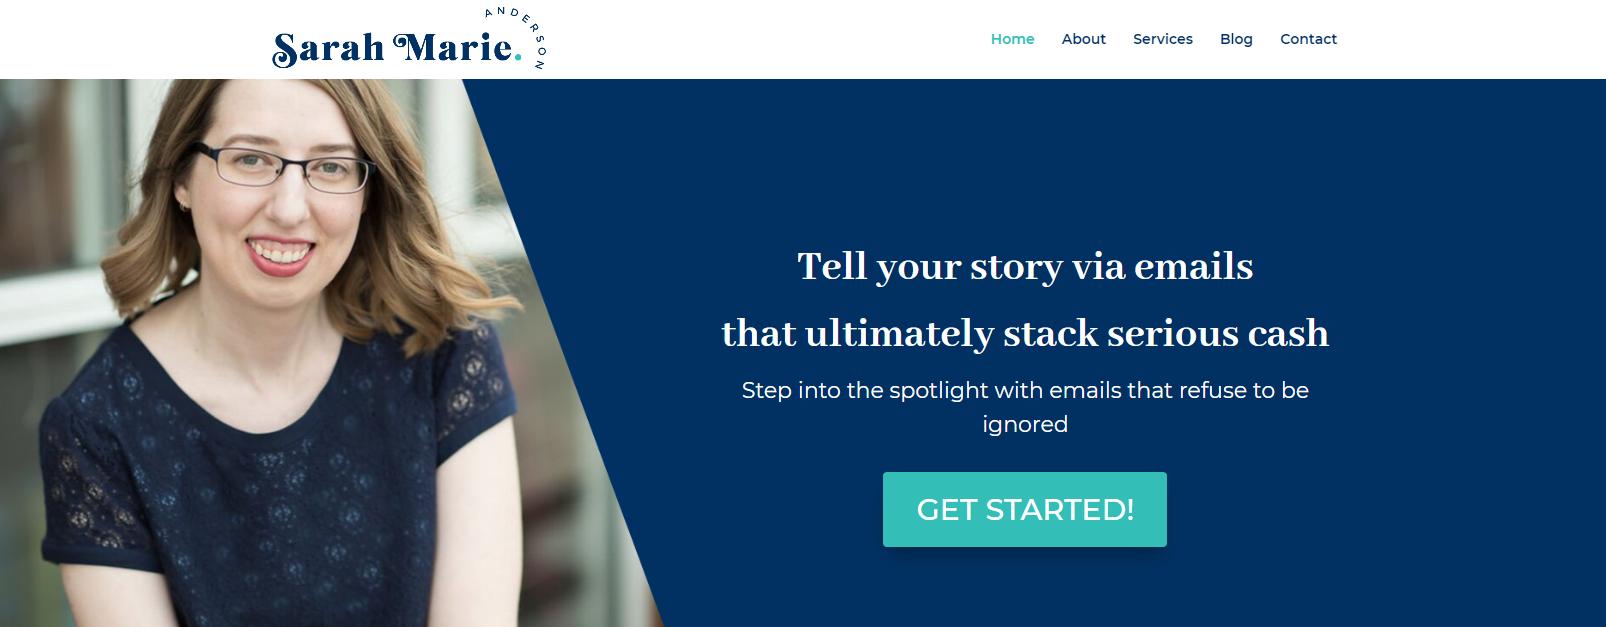 improve-website-design-tagline